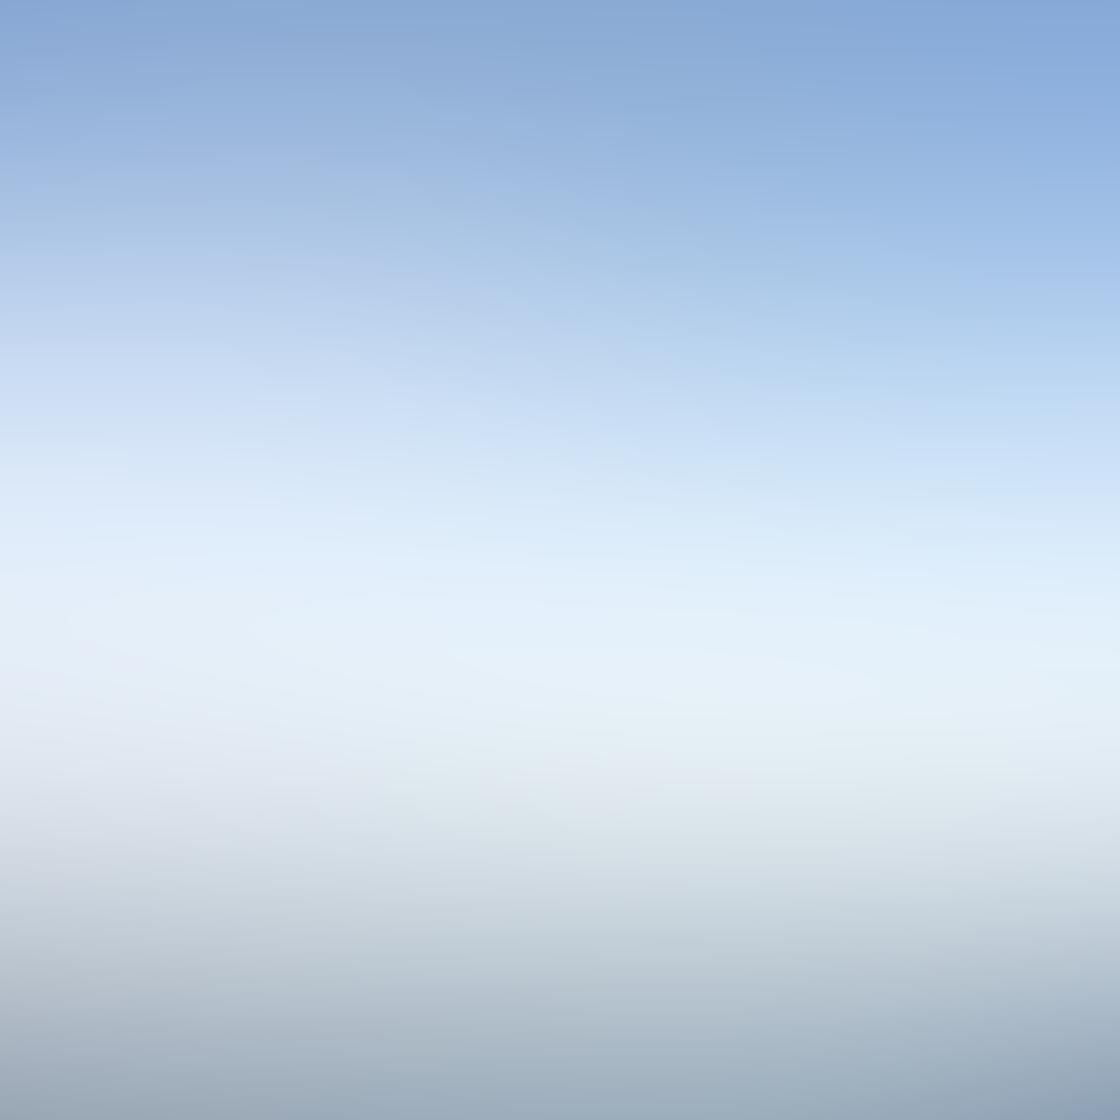 Minimalist Landscape iPhone Photos 3